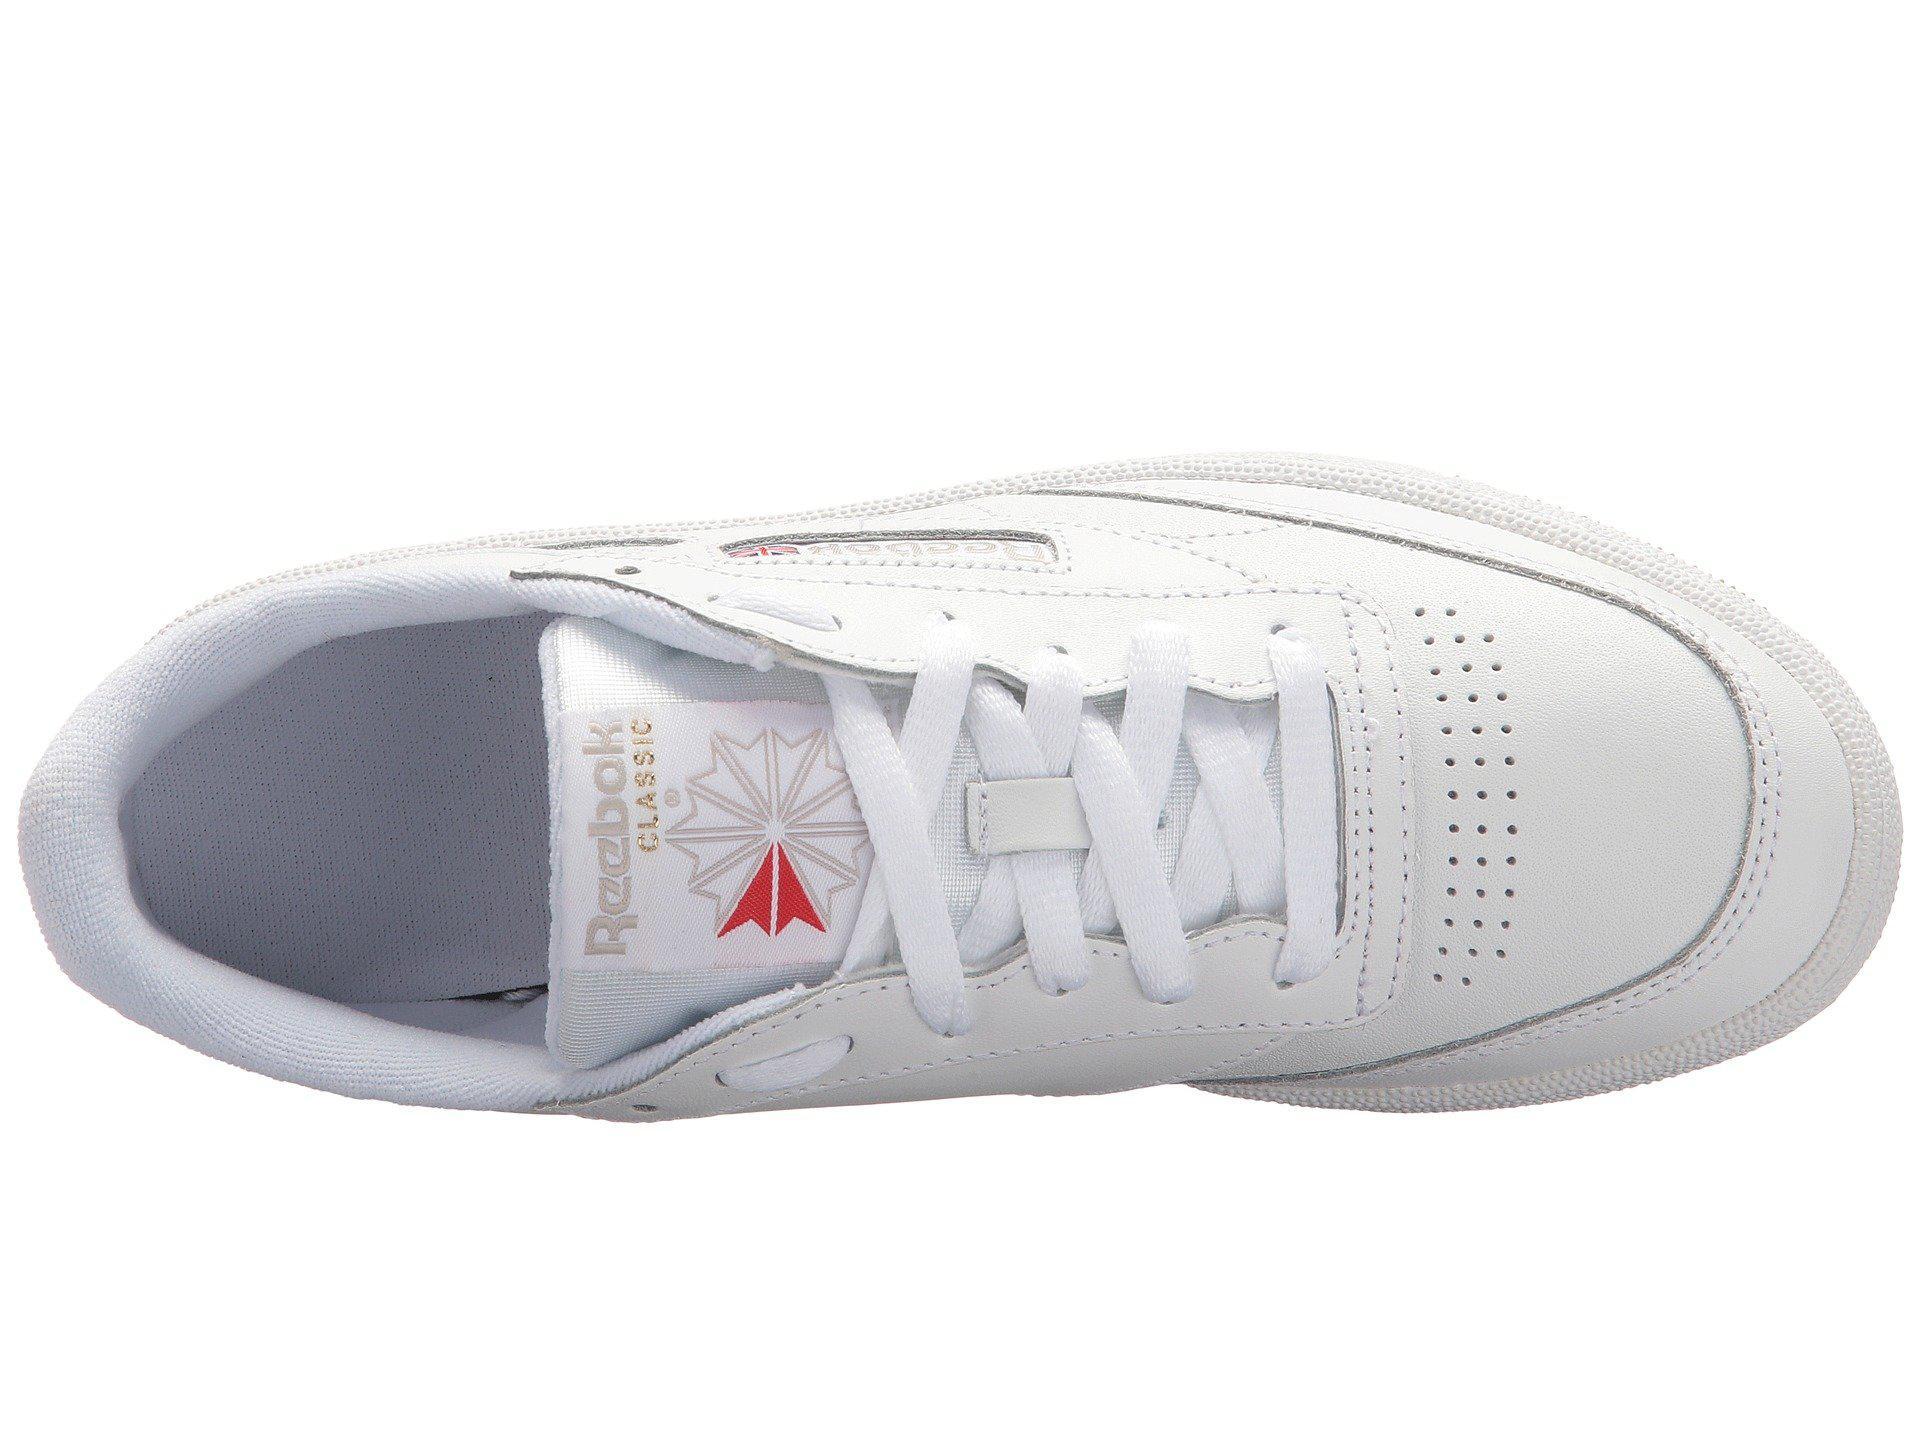 ce1325af83c Reebok - Multicolor Club C 85 (white light Grey gum) Women s Shoes. View  fullscreen